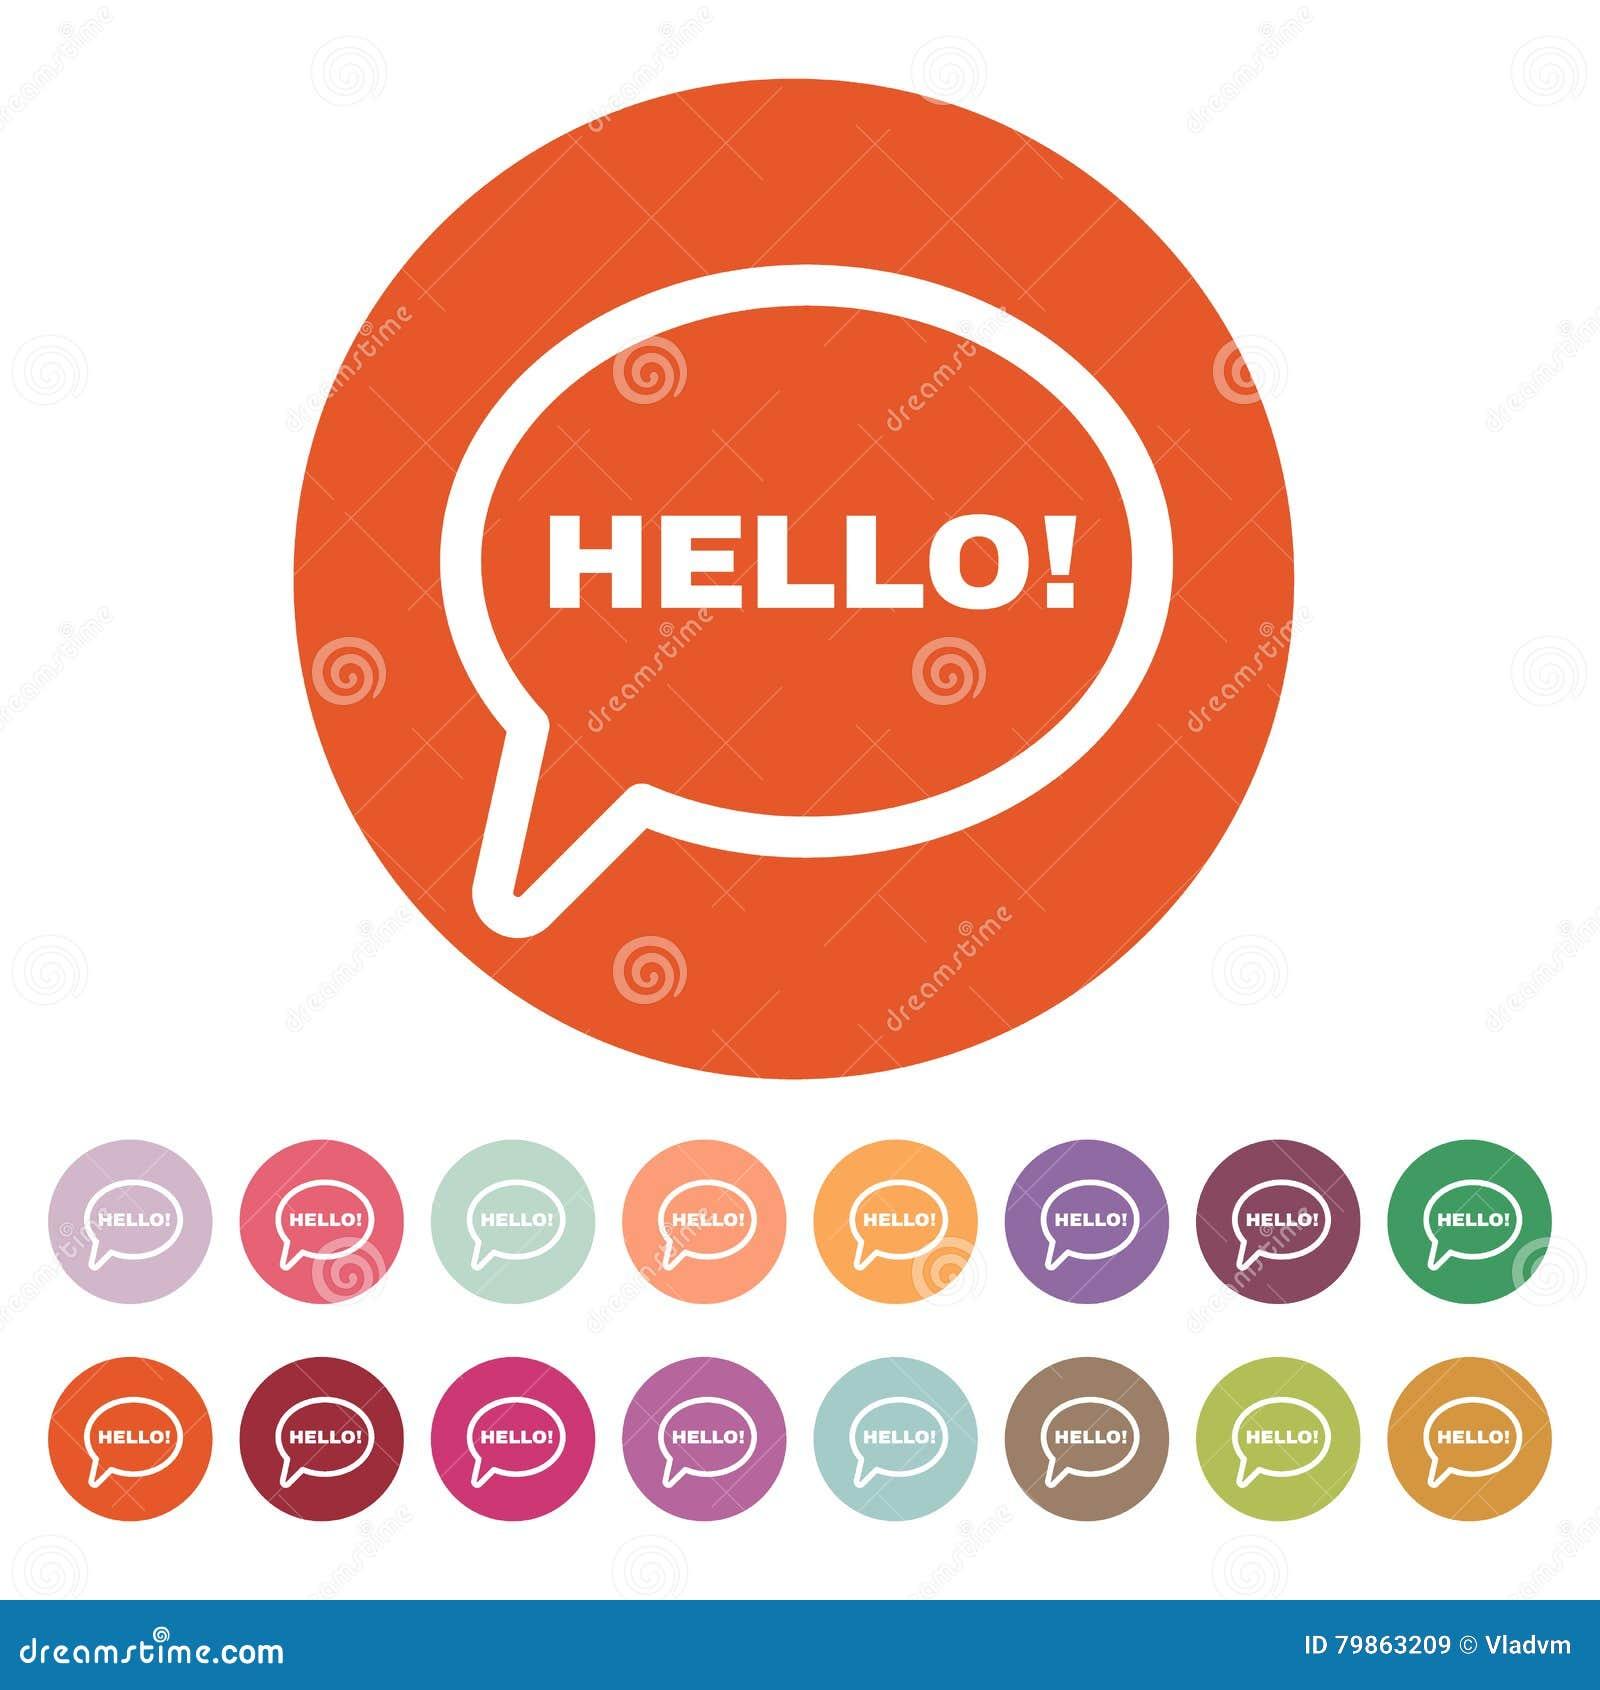 The hello icon greet and hi symbol flat stock vector greet and hi symbol flat m4hsunfo